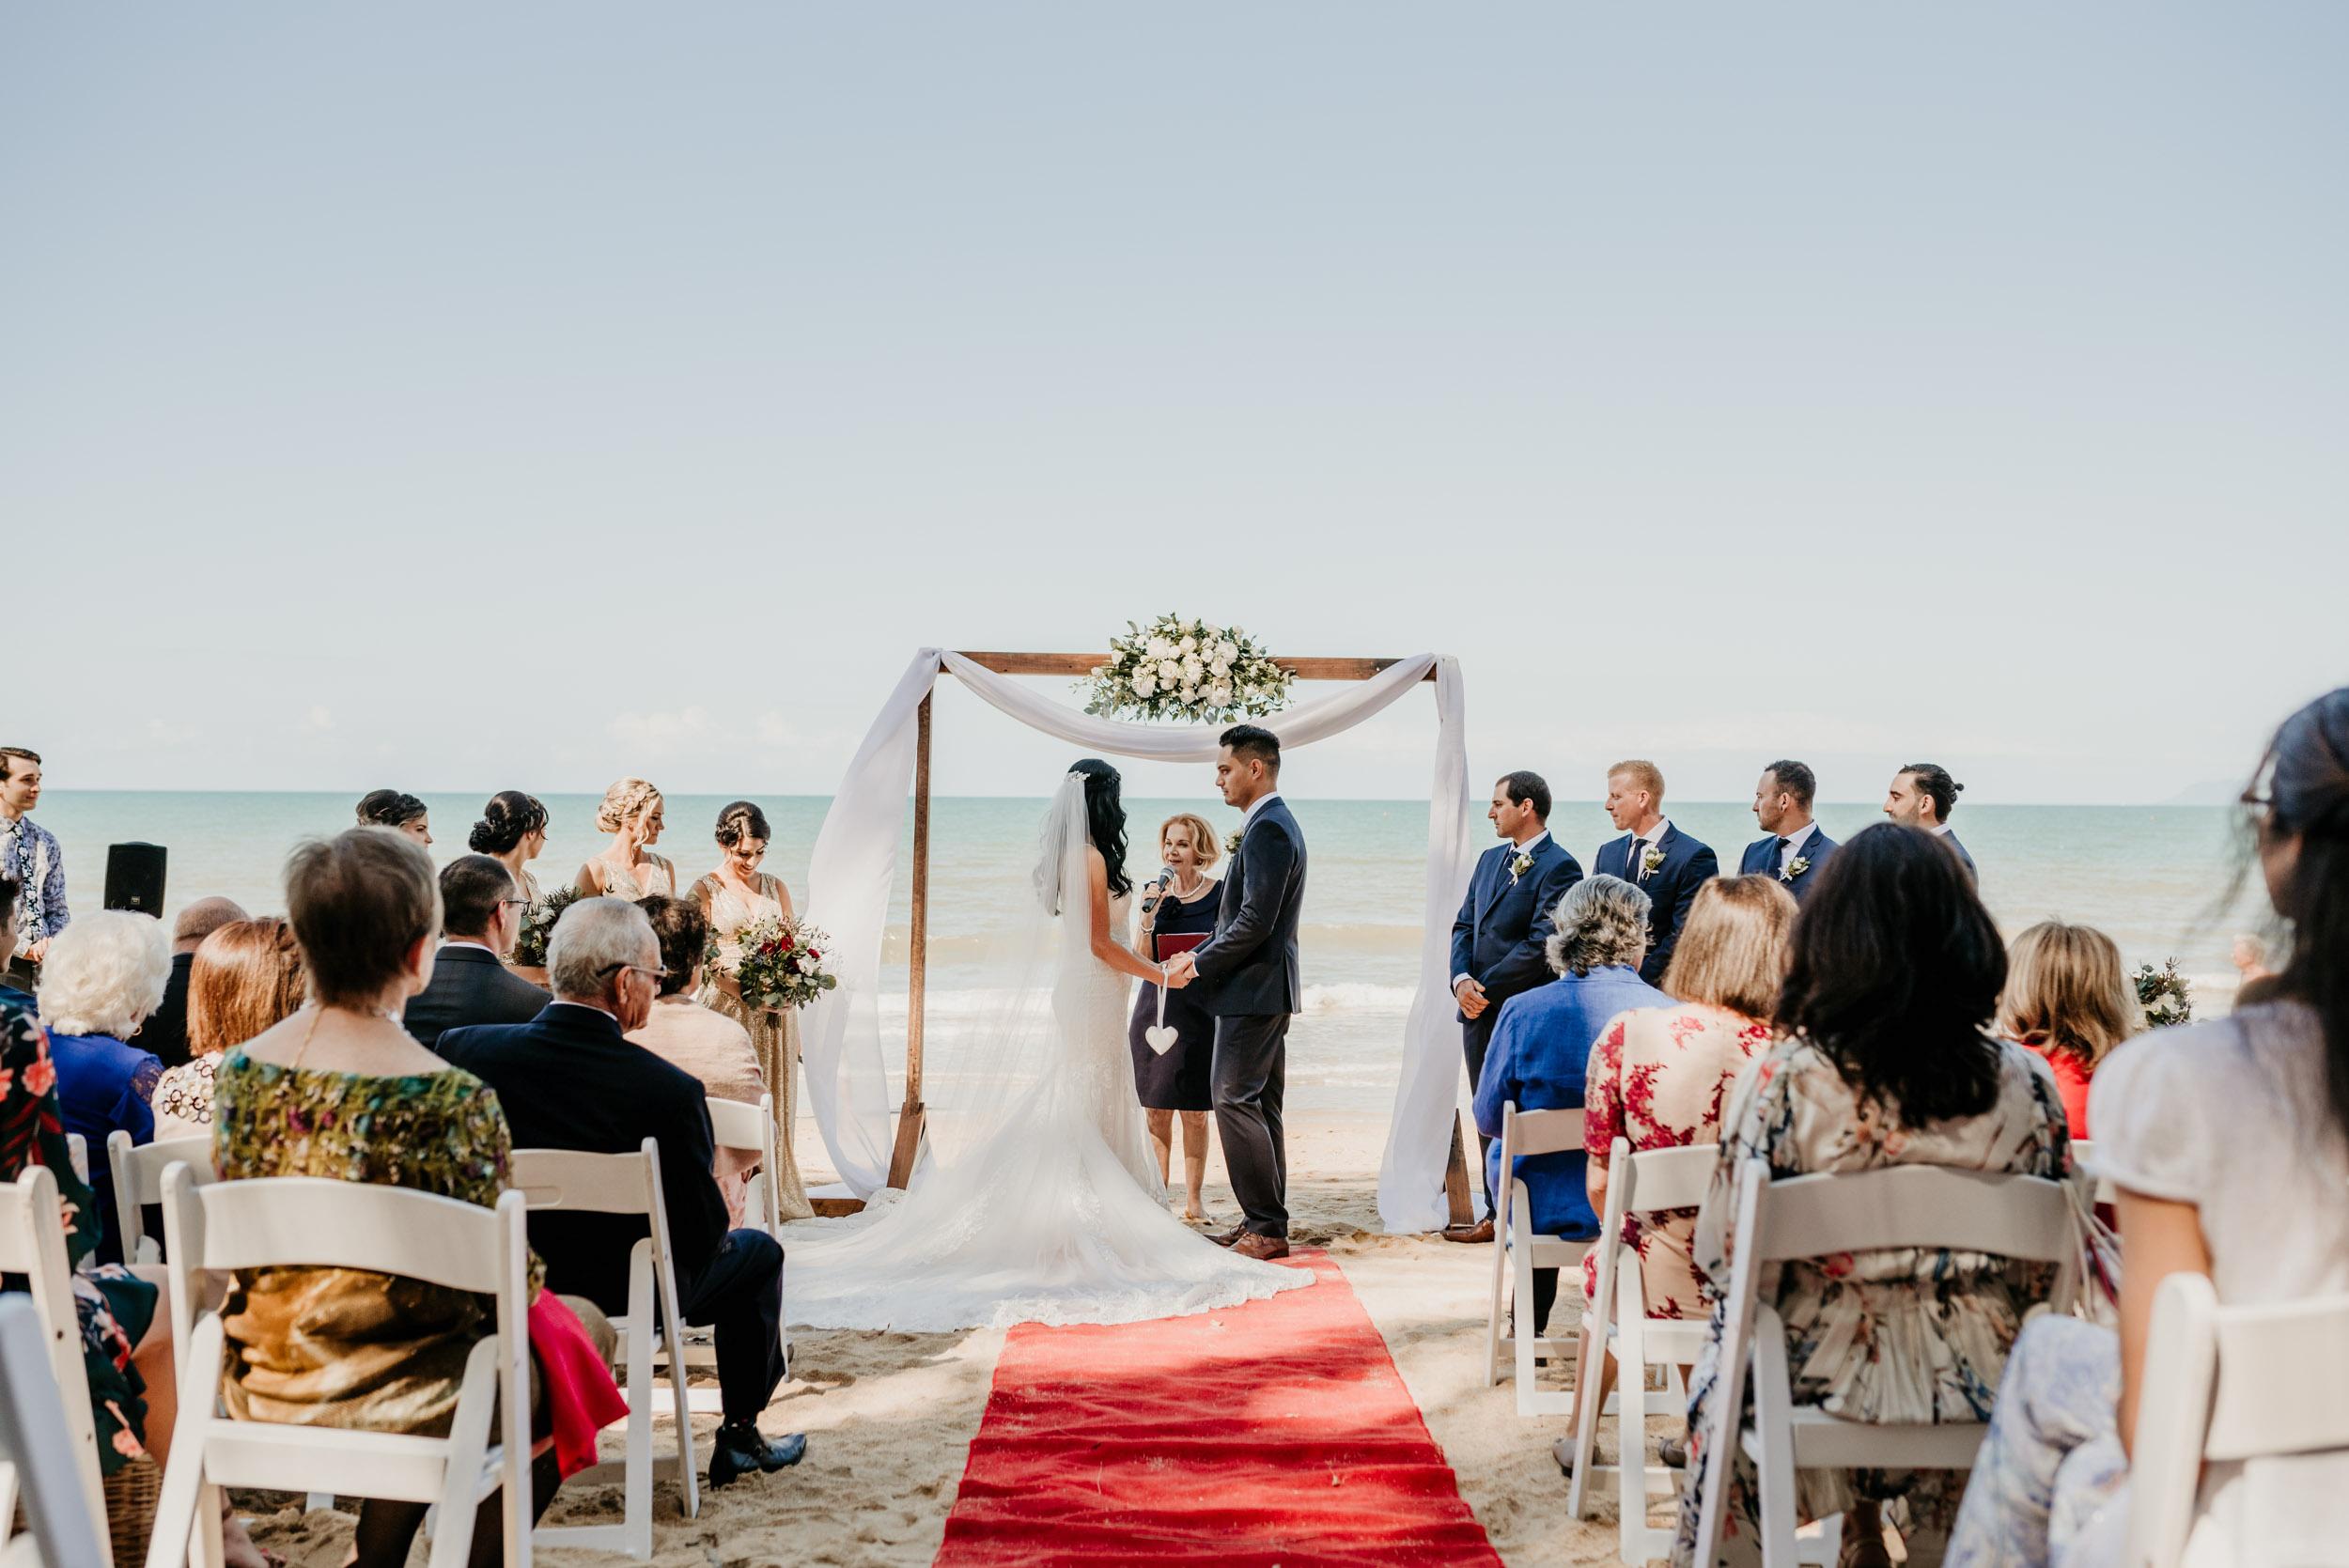 The Raw Photographer - Cairns Wedding Photographer - Beach Palm Cove Ceremony - Dress Irene Costa's Devine Bridal - Queensland-32.jpg